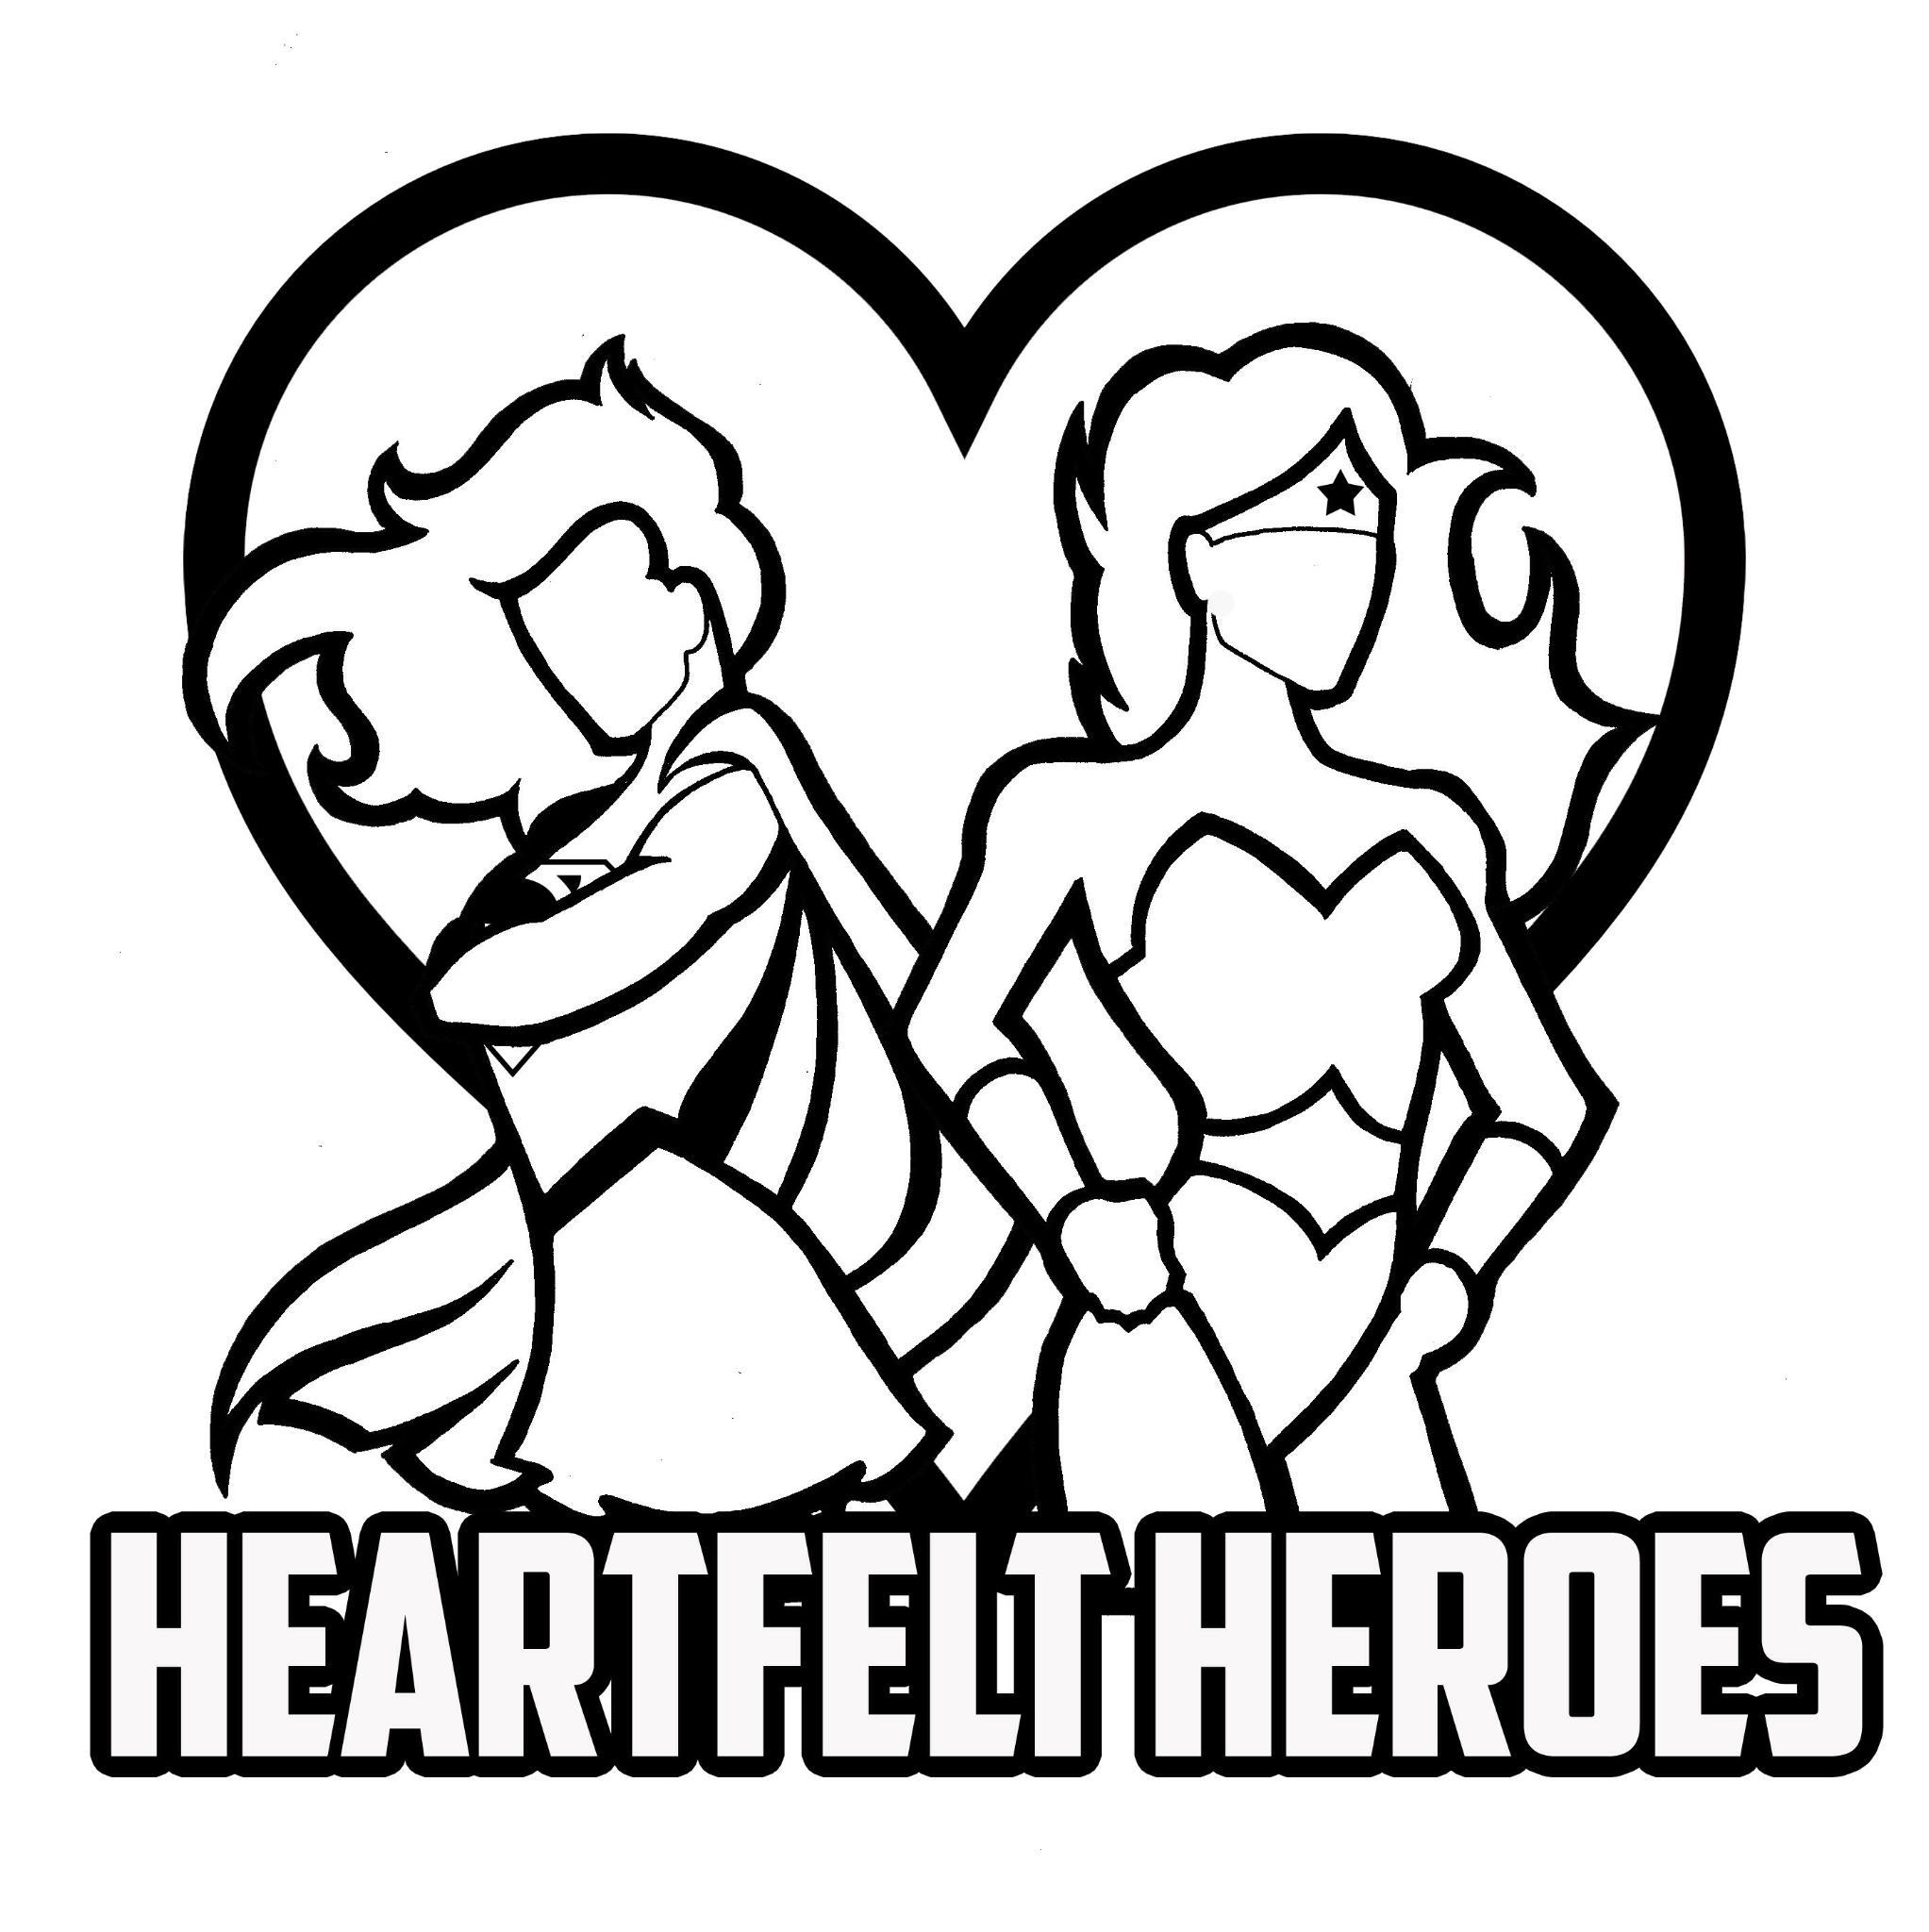 Heartfelt Heroes